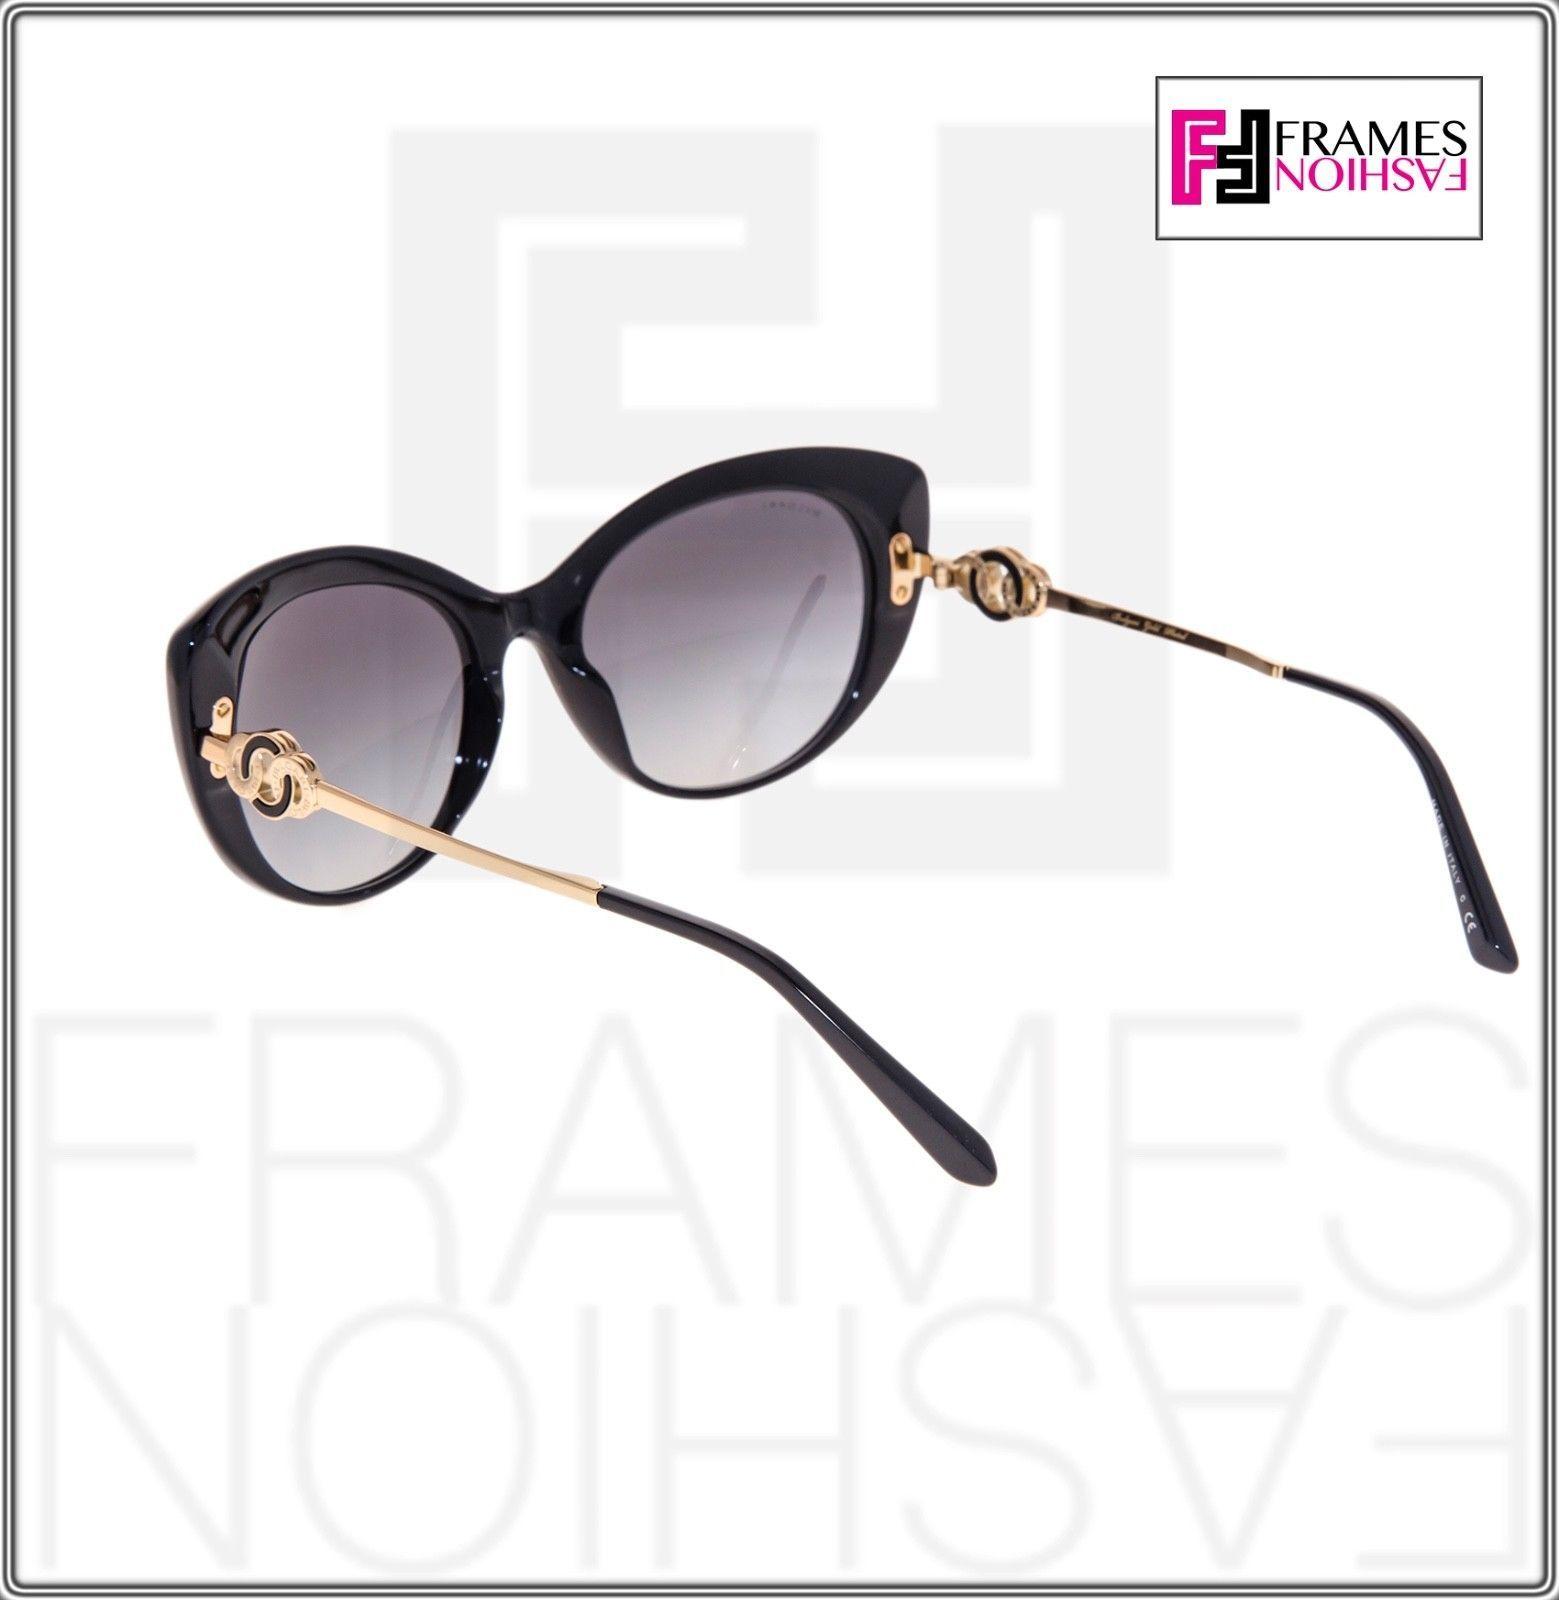 BVLGARI Le Gemme BV 8141K  Black Rose 18K Gold Plated Edition Cat Eye Sunglasses